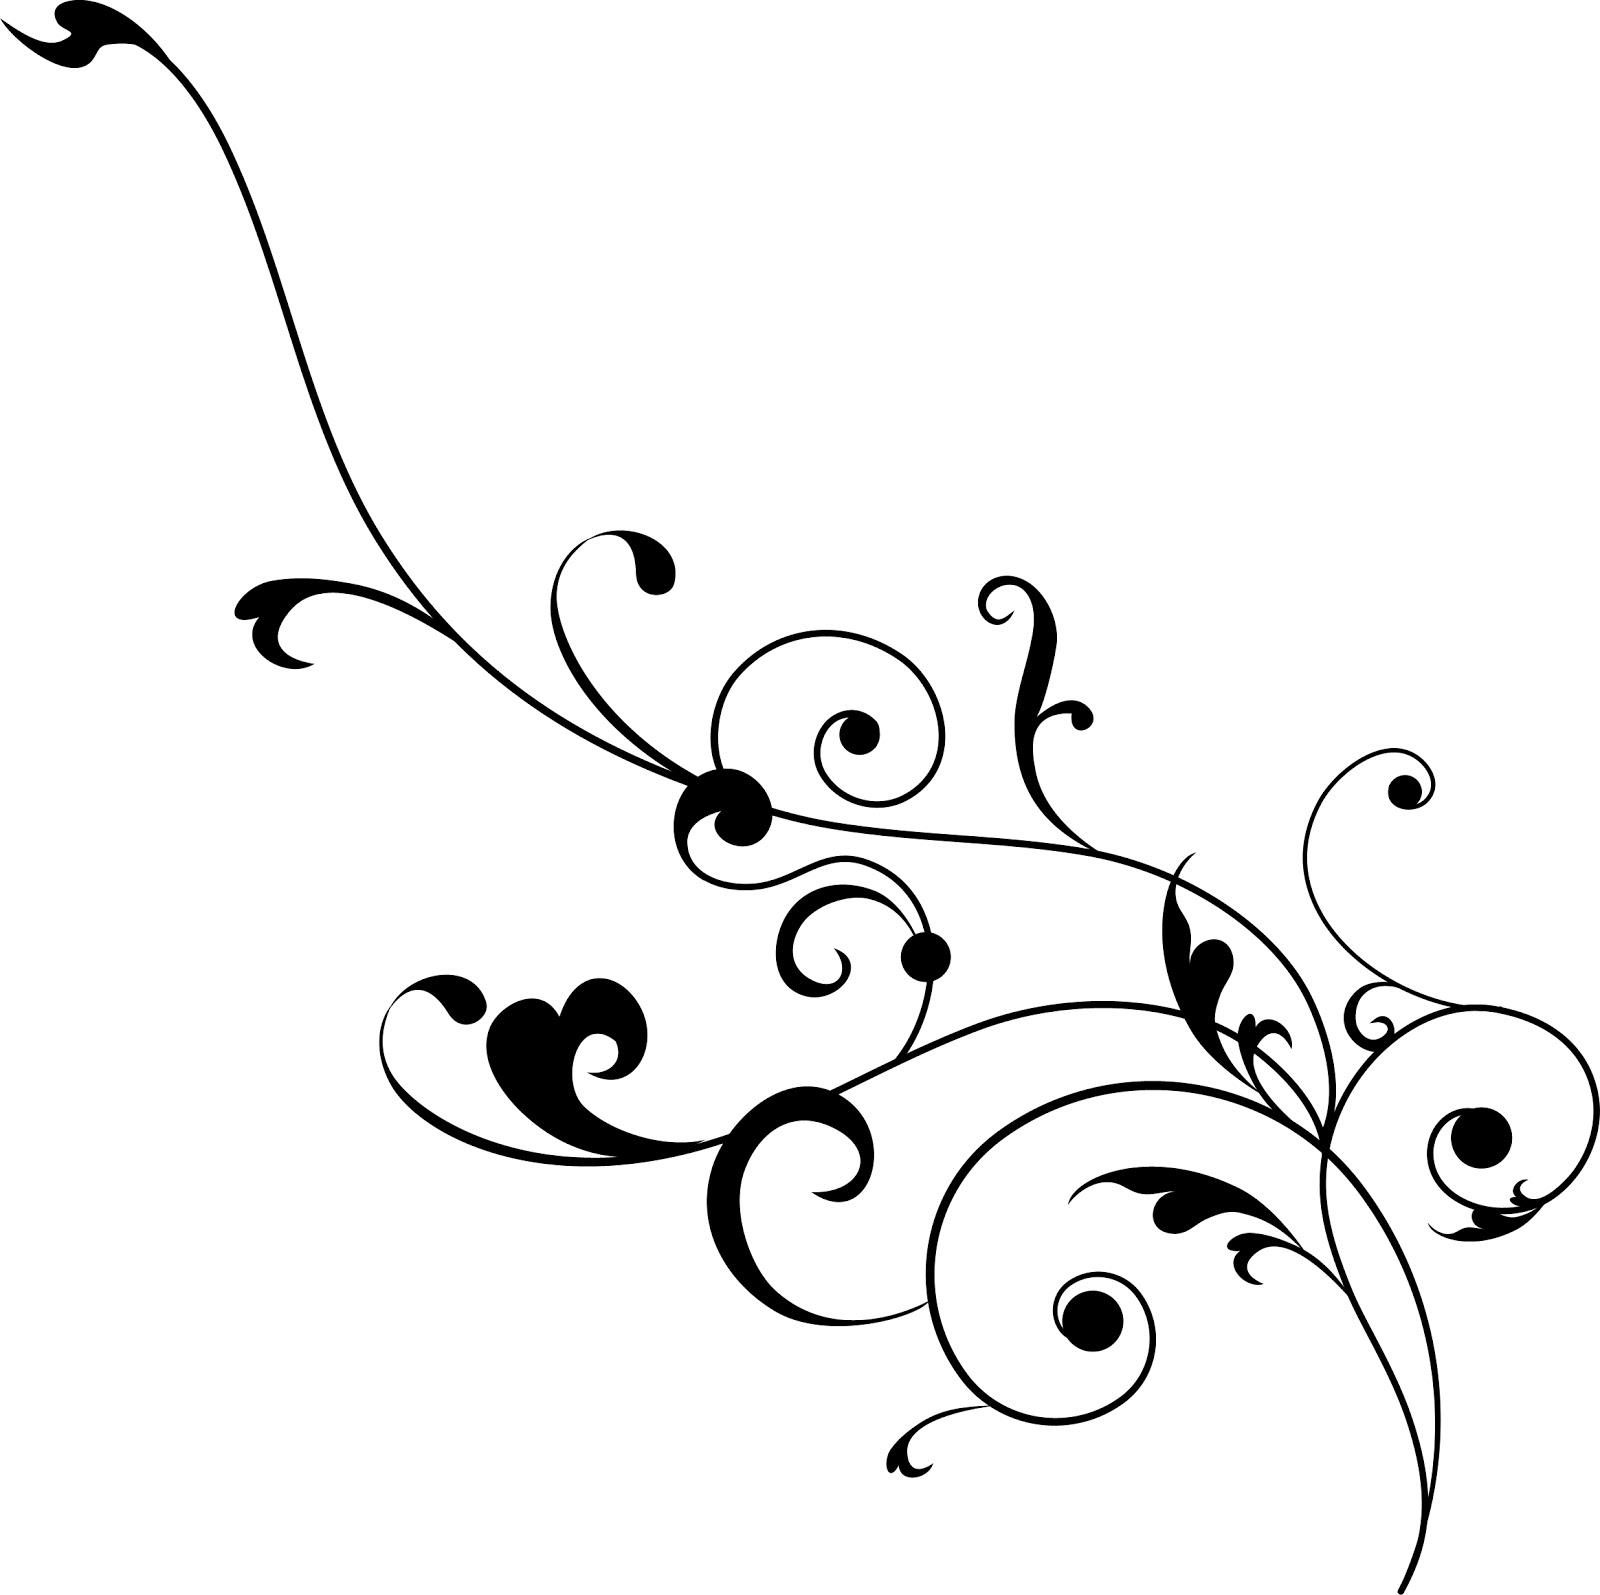 Fenfolio Artistic Explorations Swirls 1